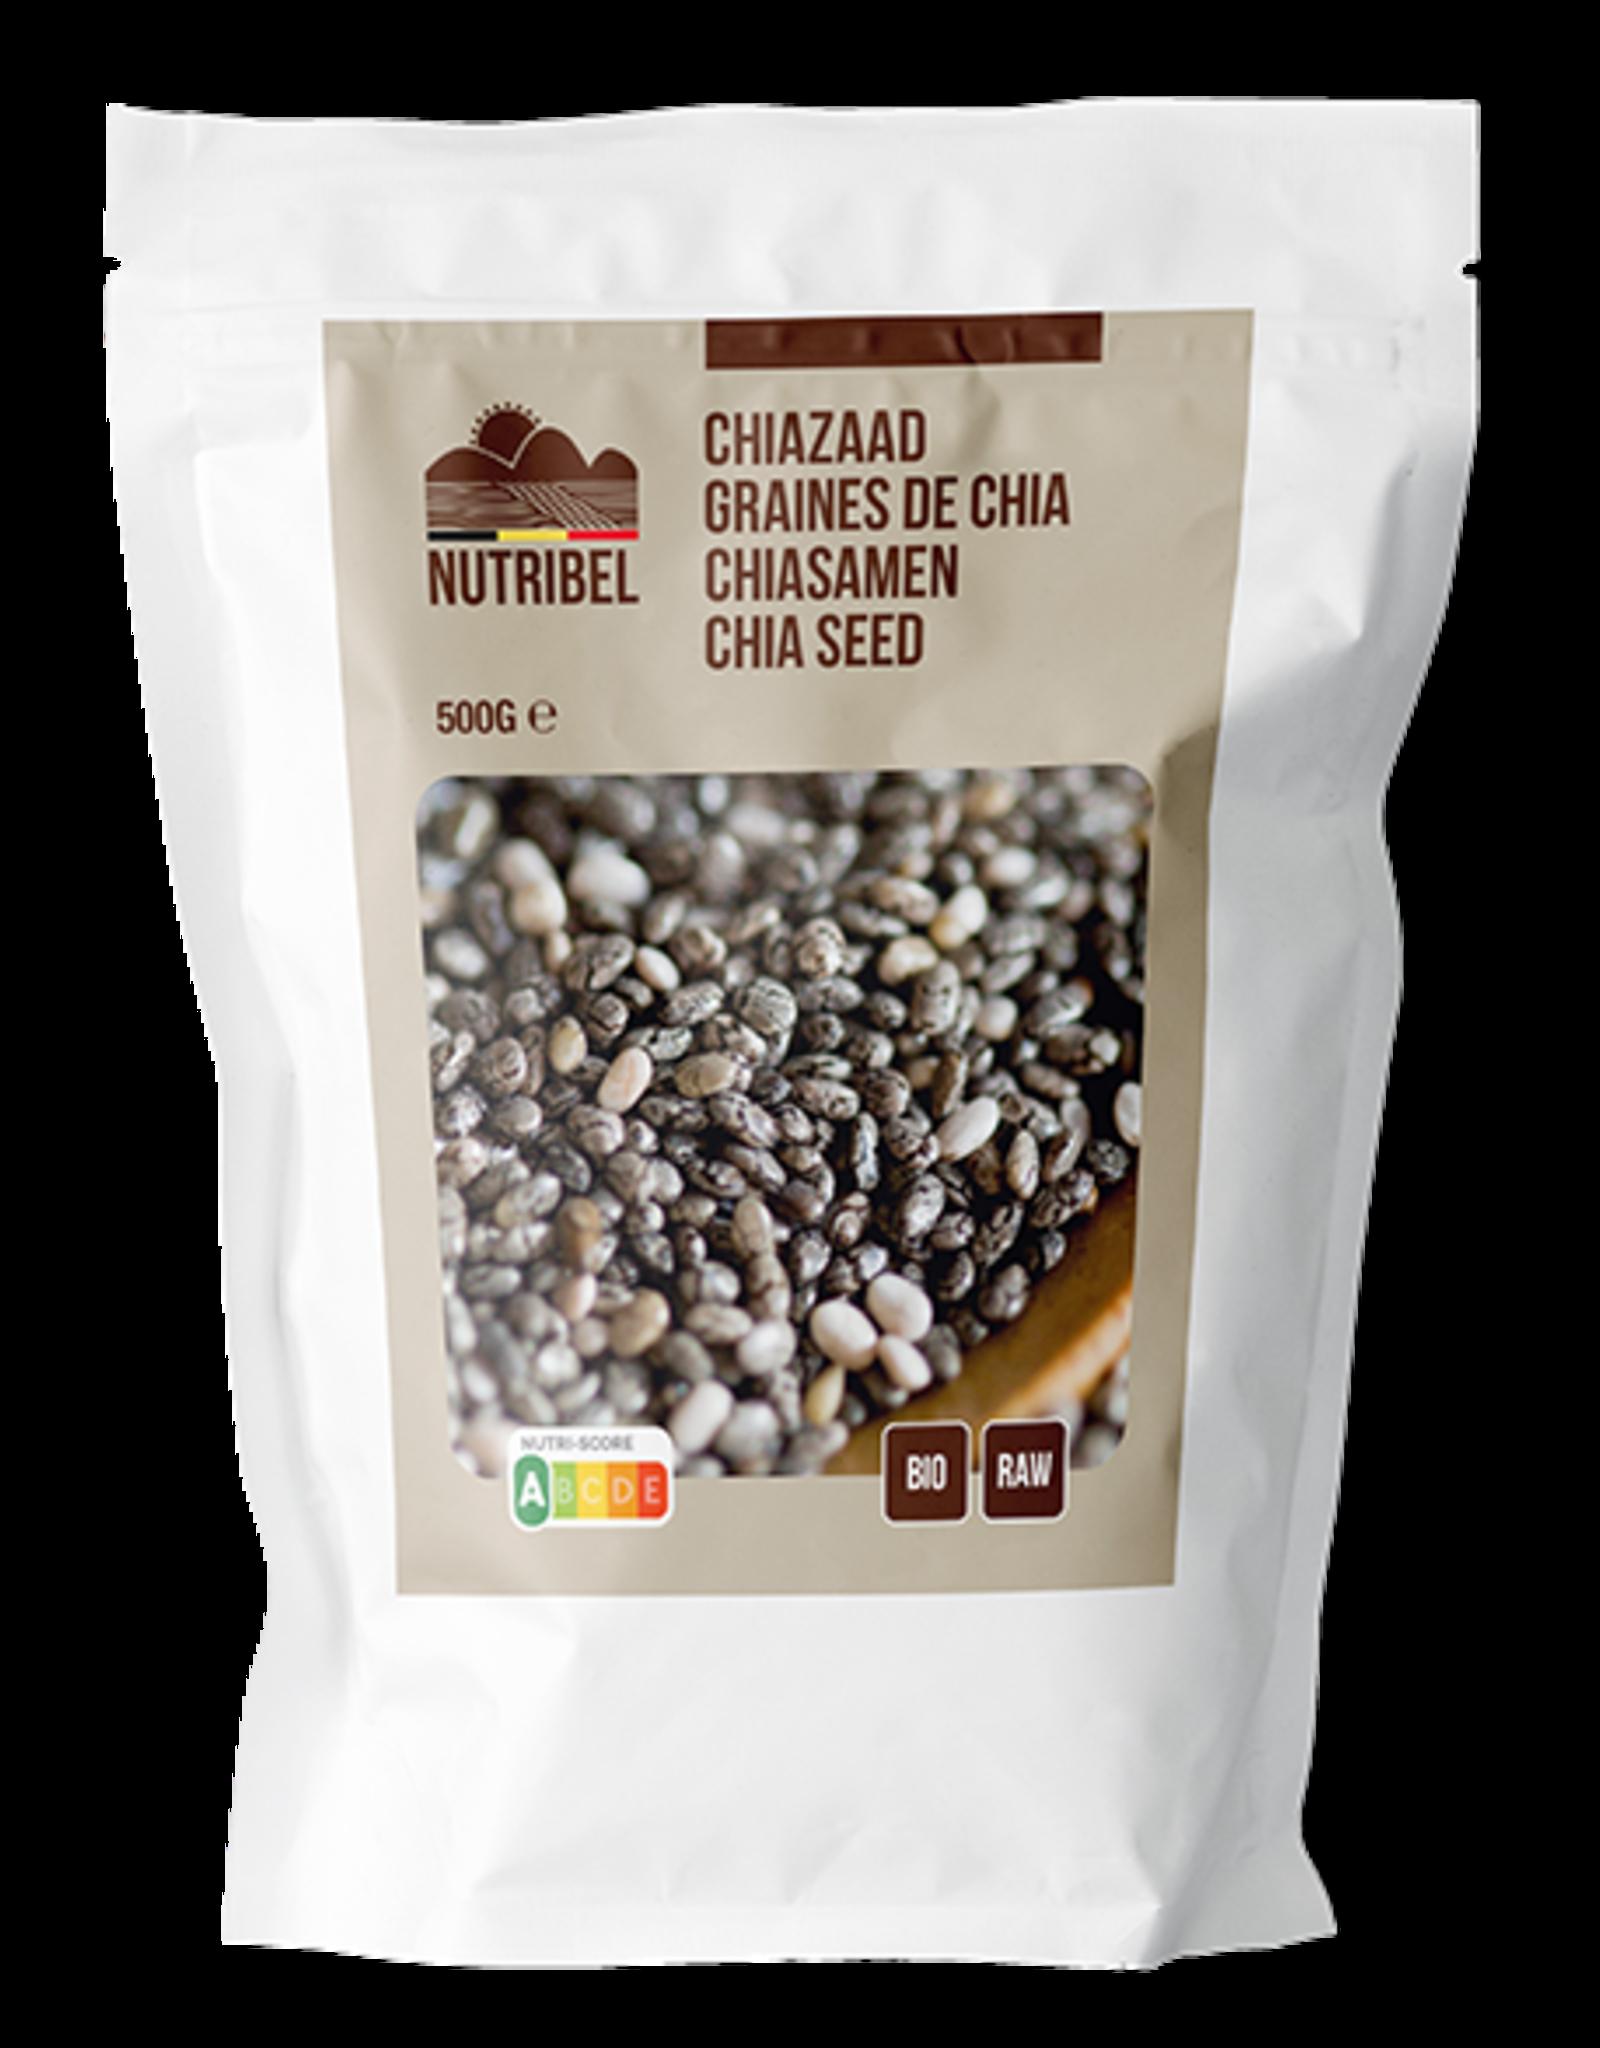 Nutribel Chiazaad bio & raw 500g